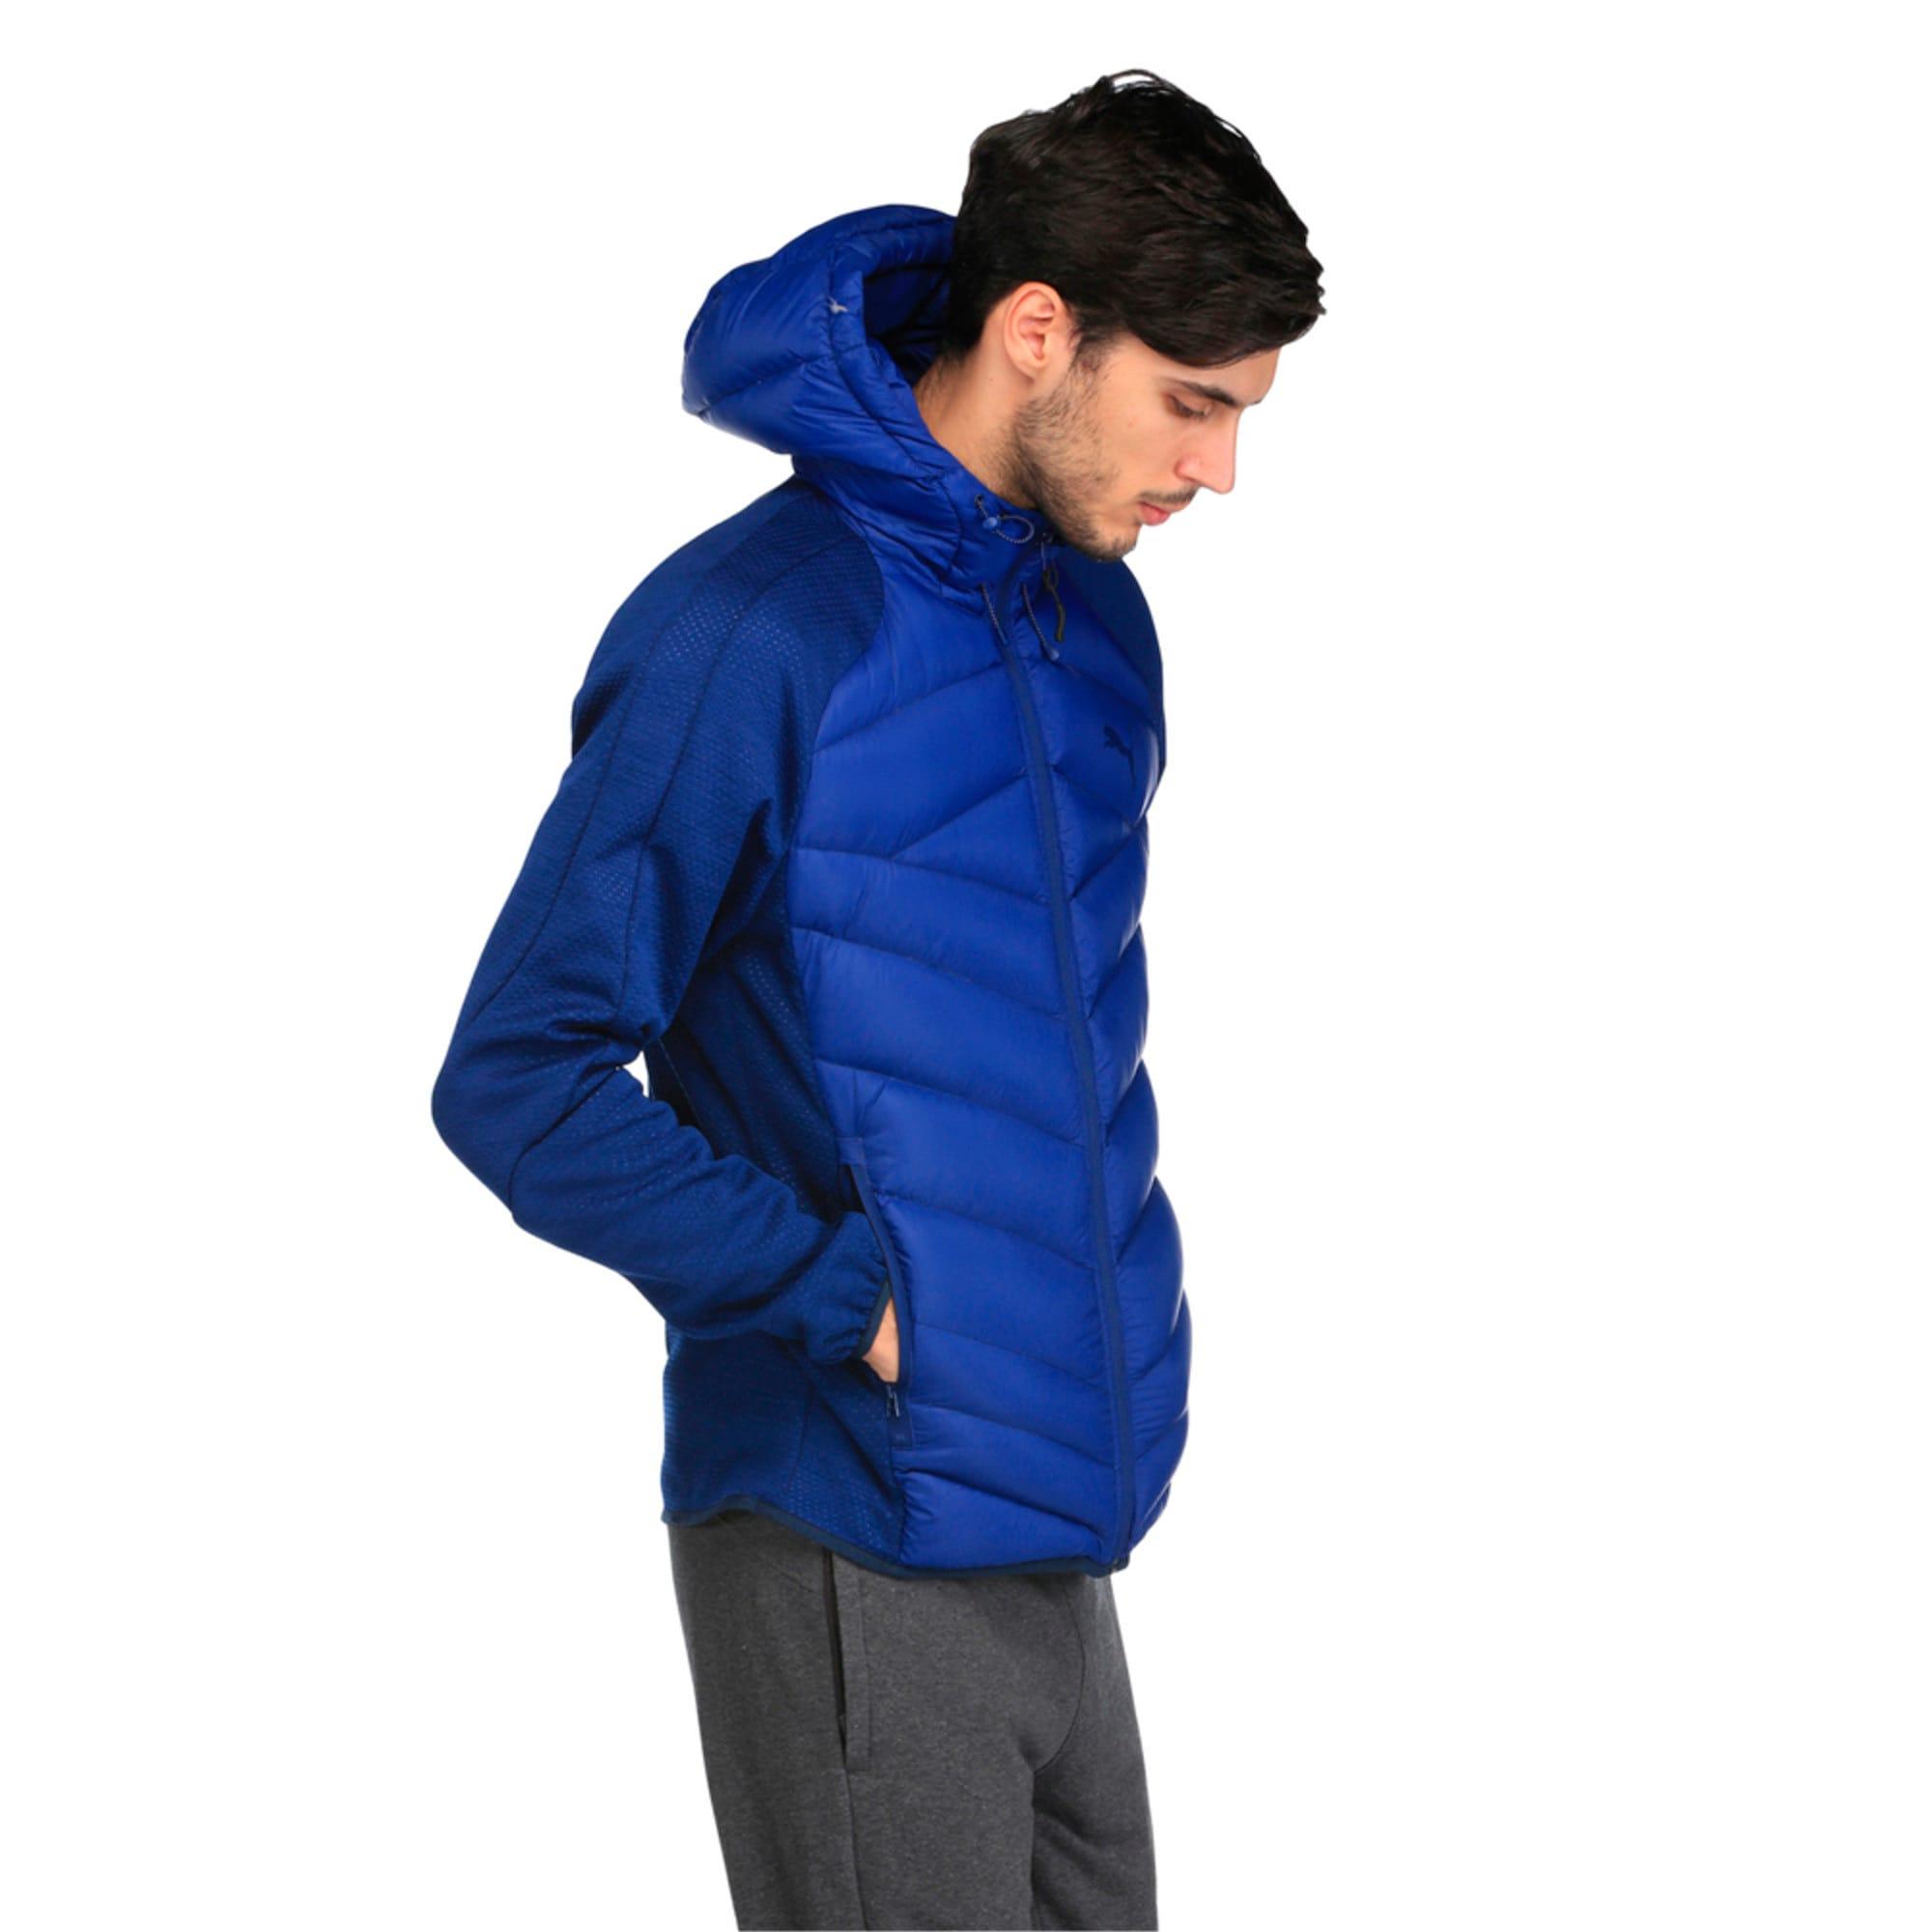 Thumbnail 3 of Double Knit Hybrid 600 Down Men's Jacket, Blue Heather-Blue Depths, medium-IND